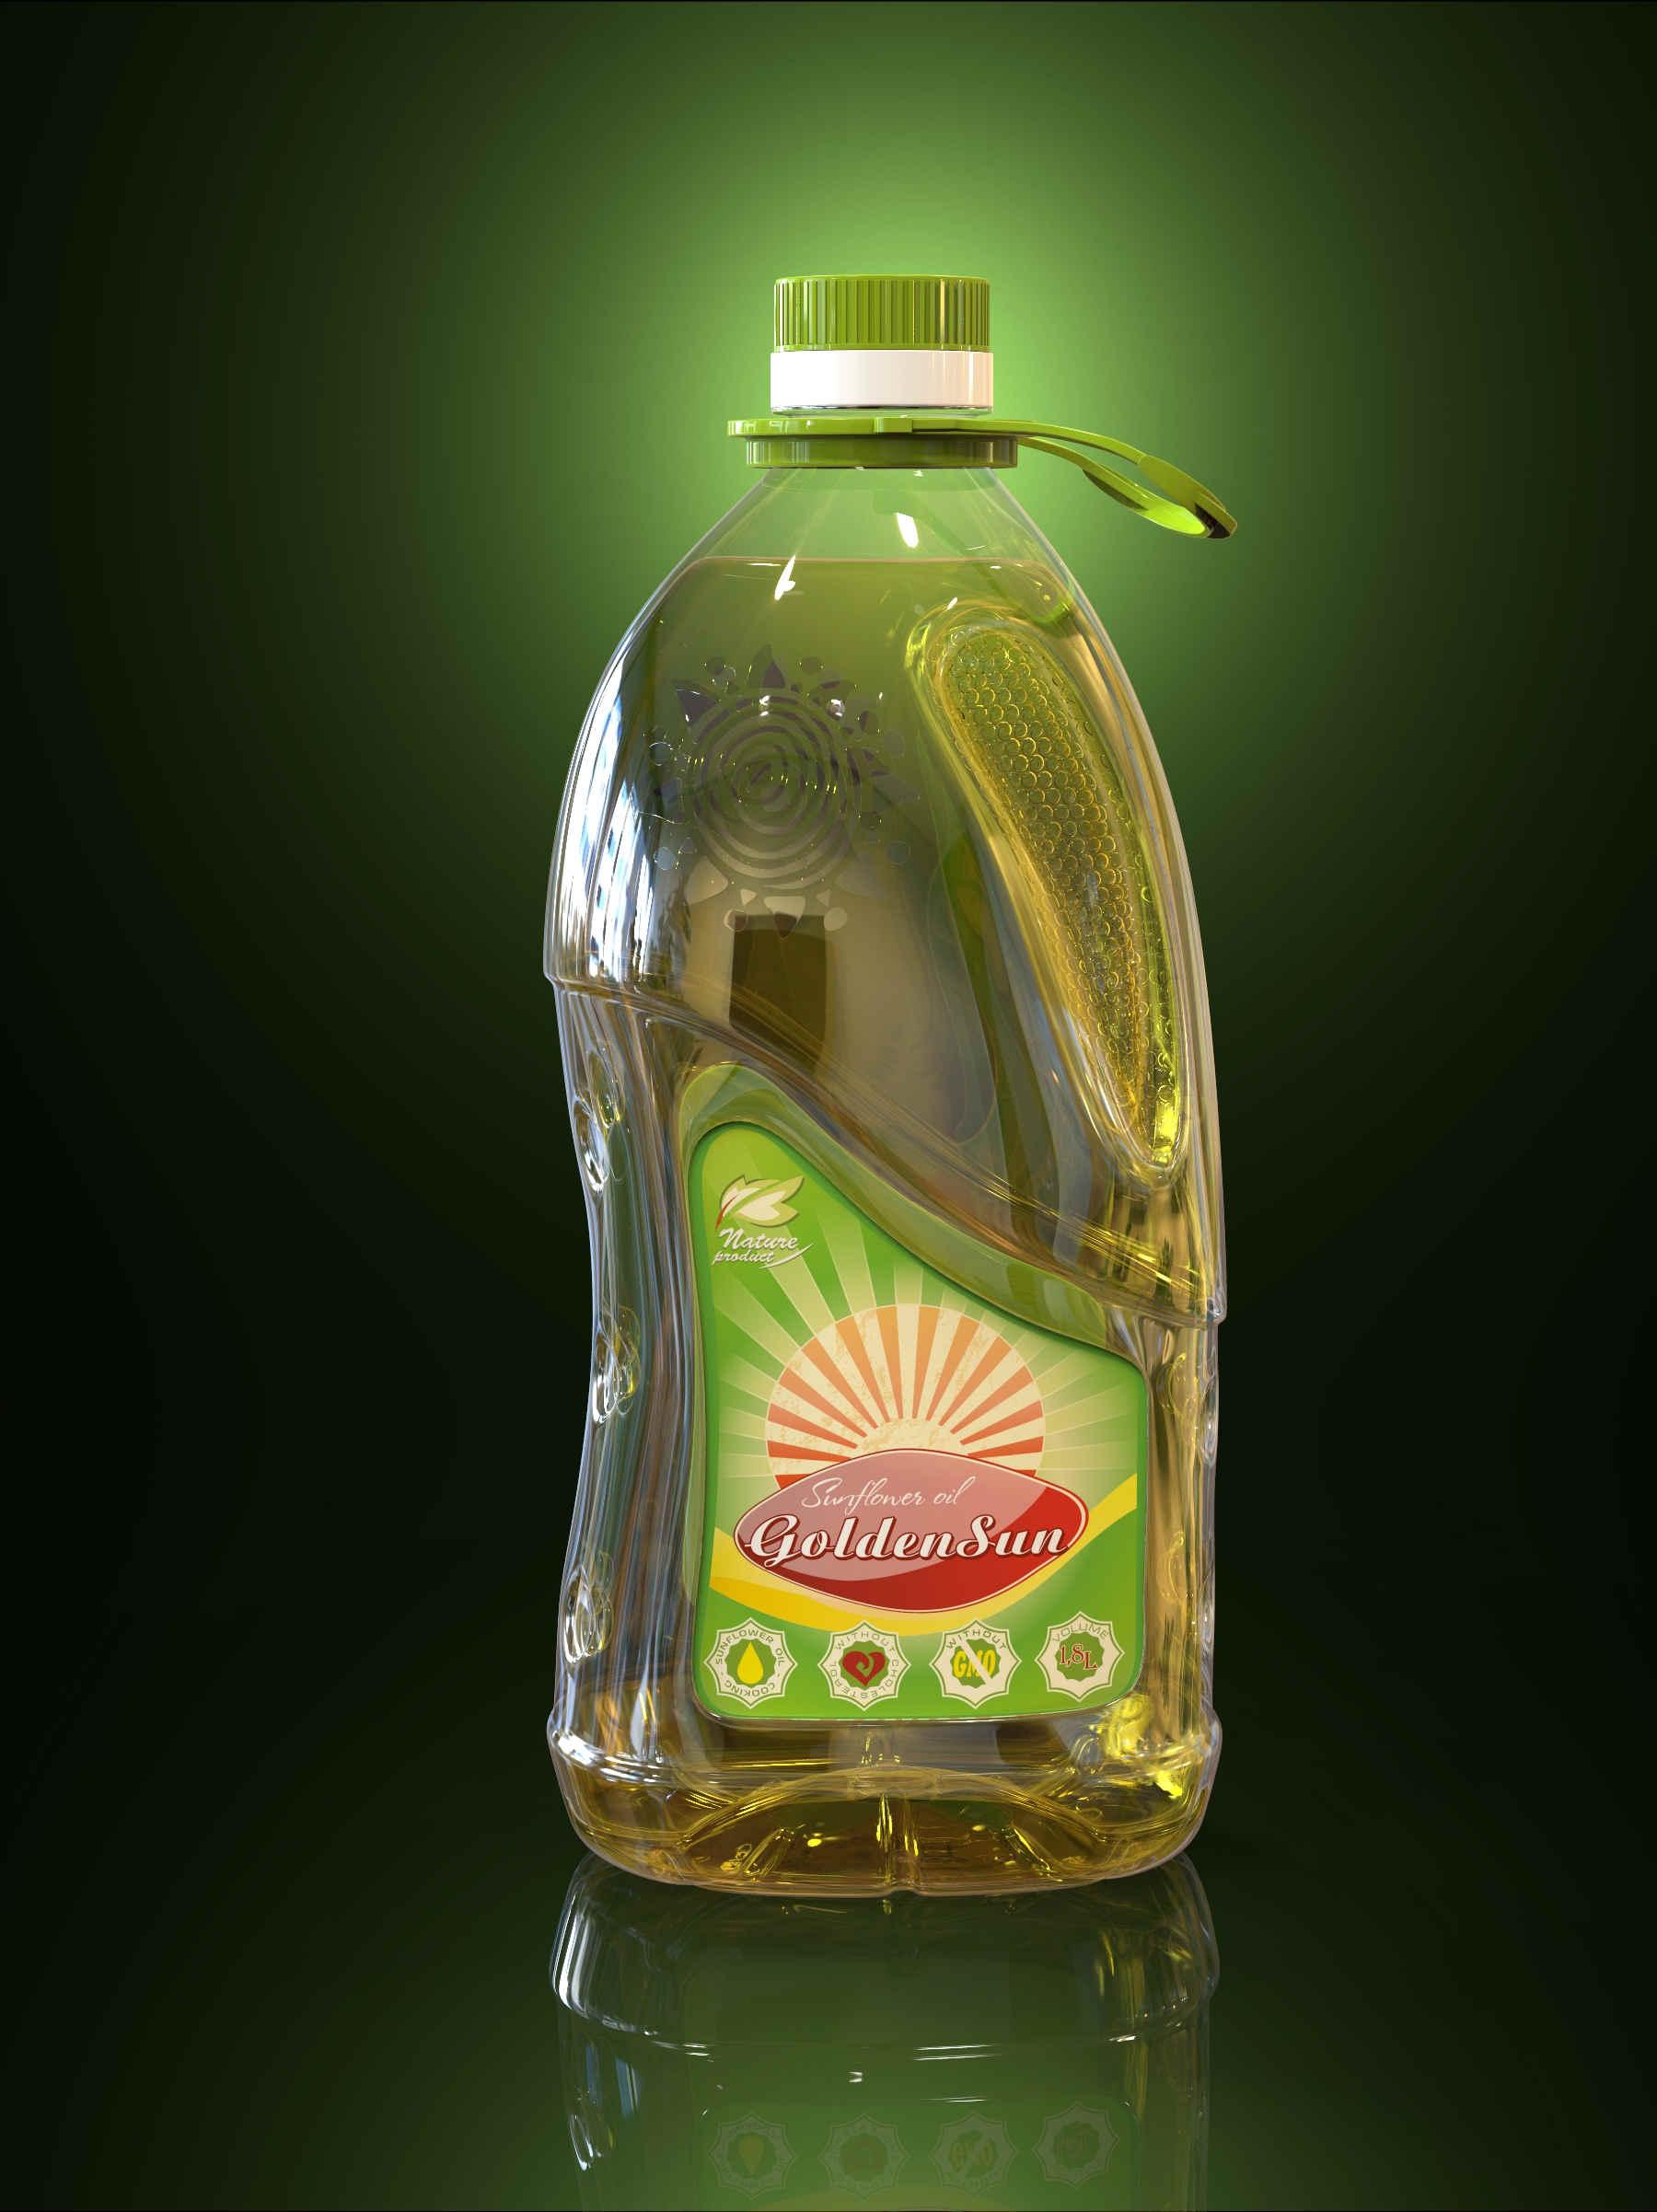 Refined Deodorized Sunflower OIl , Country of Origin Ukraine